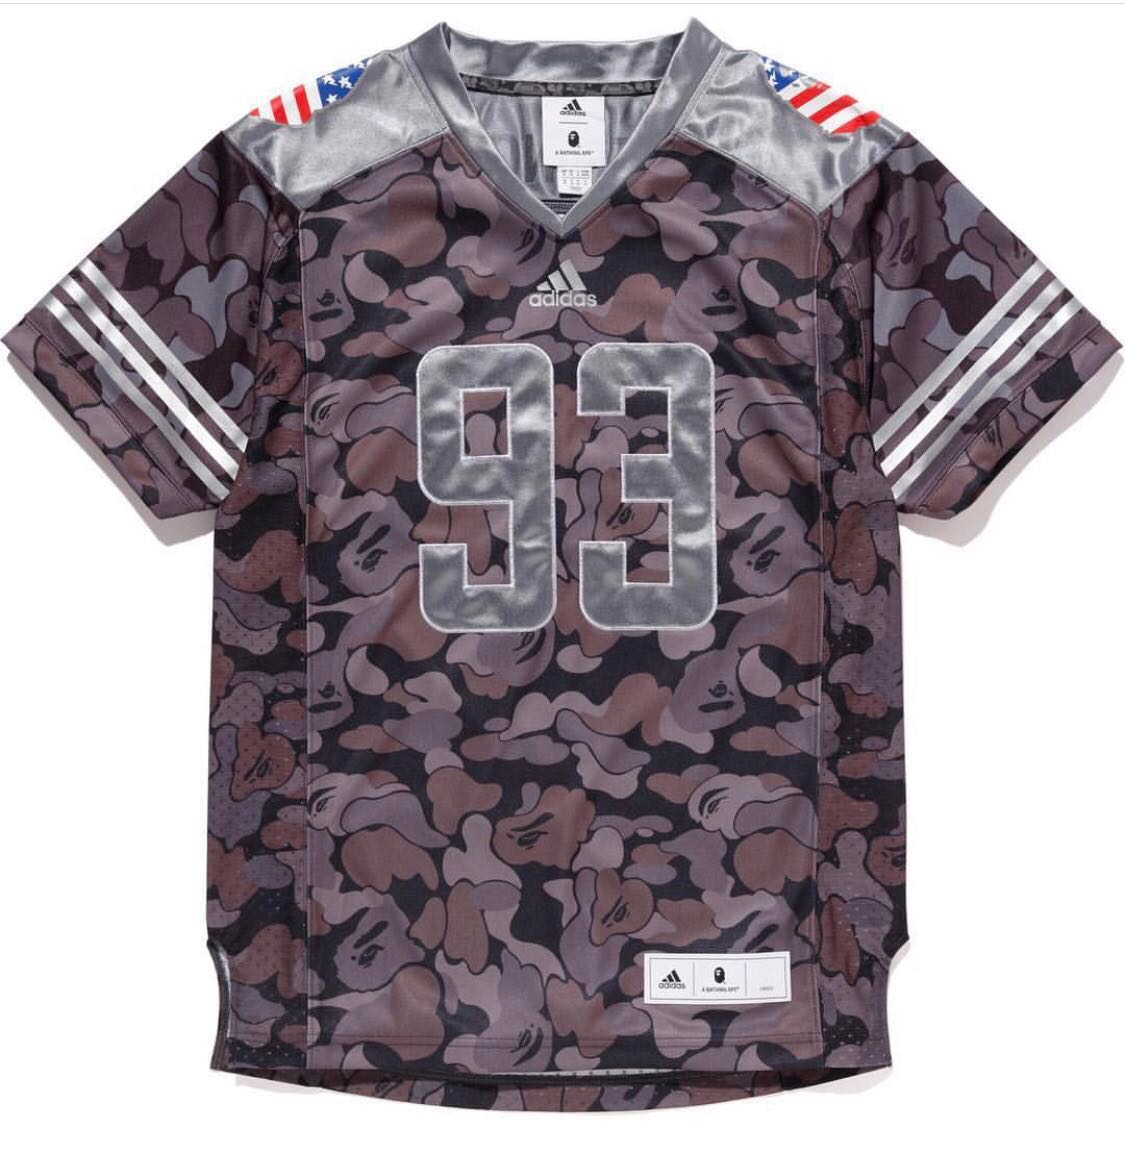 02f263b4 Bape x Adidas Football jersey Size M, Men's Fashion, Clothes, Tops ...